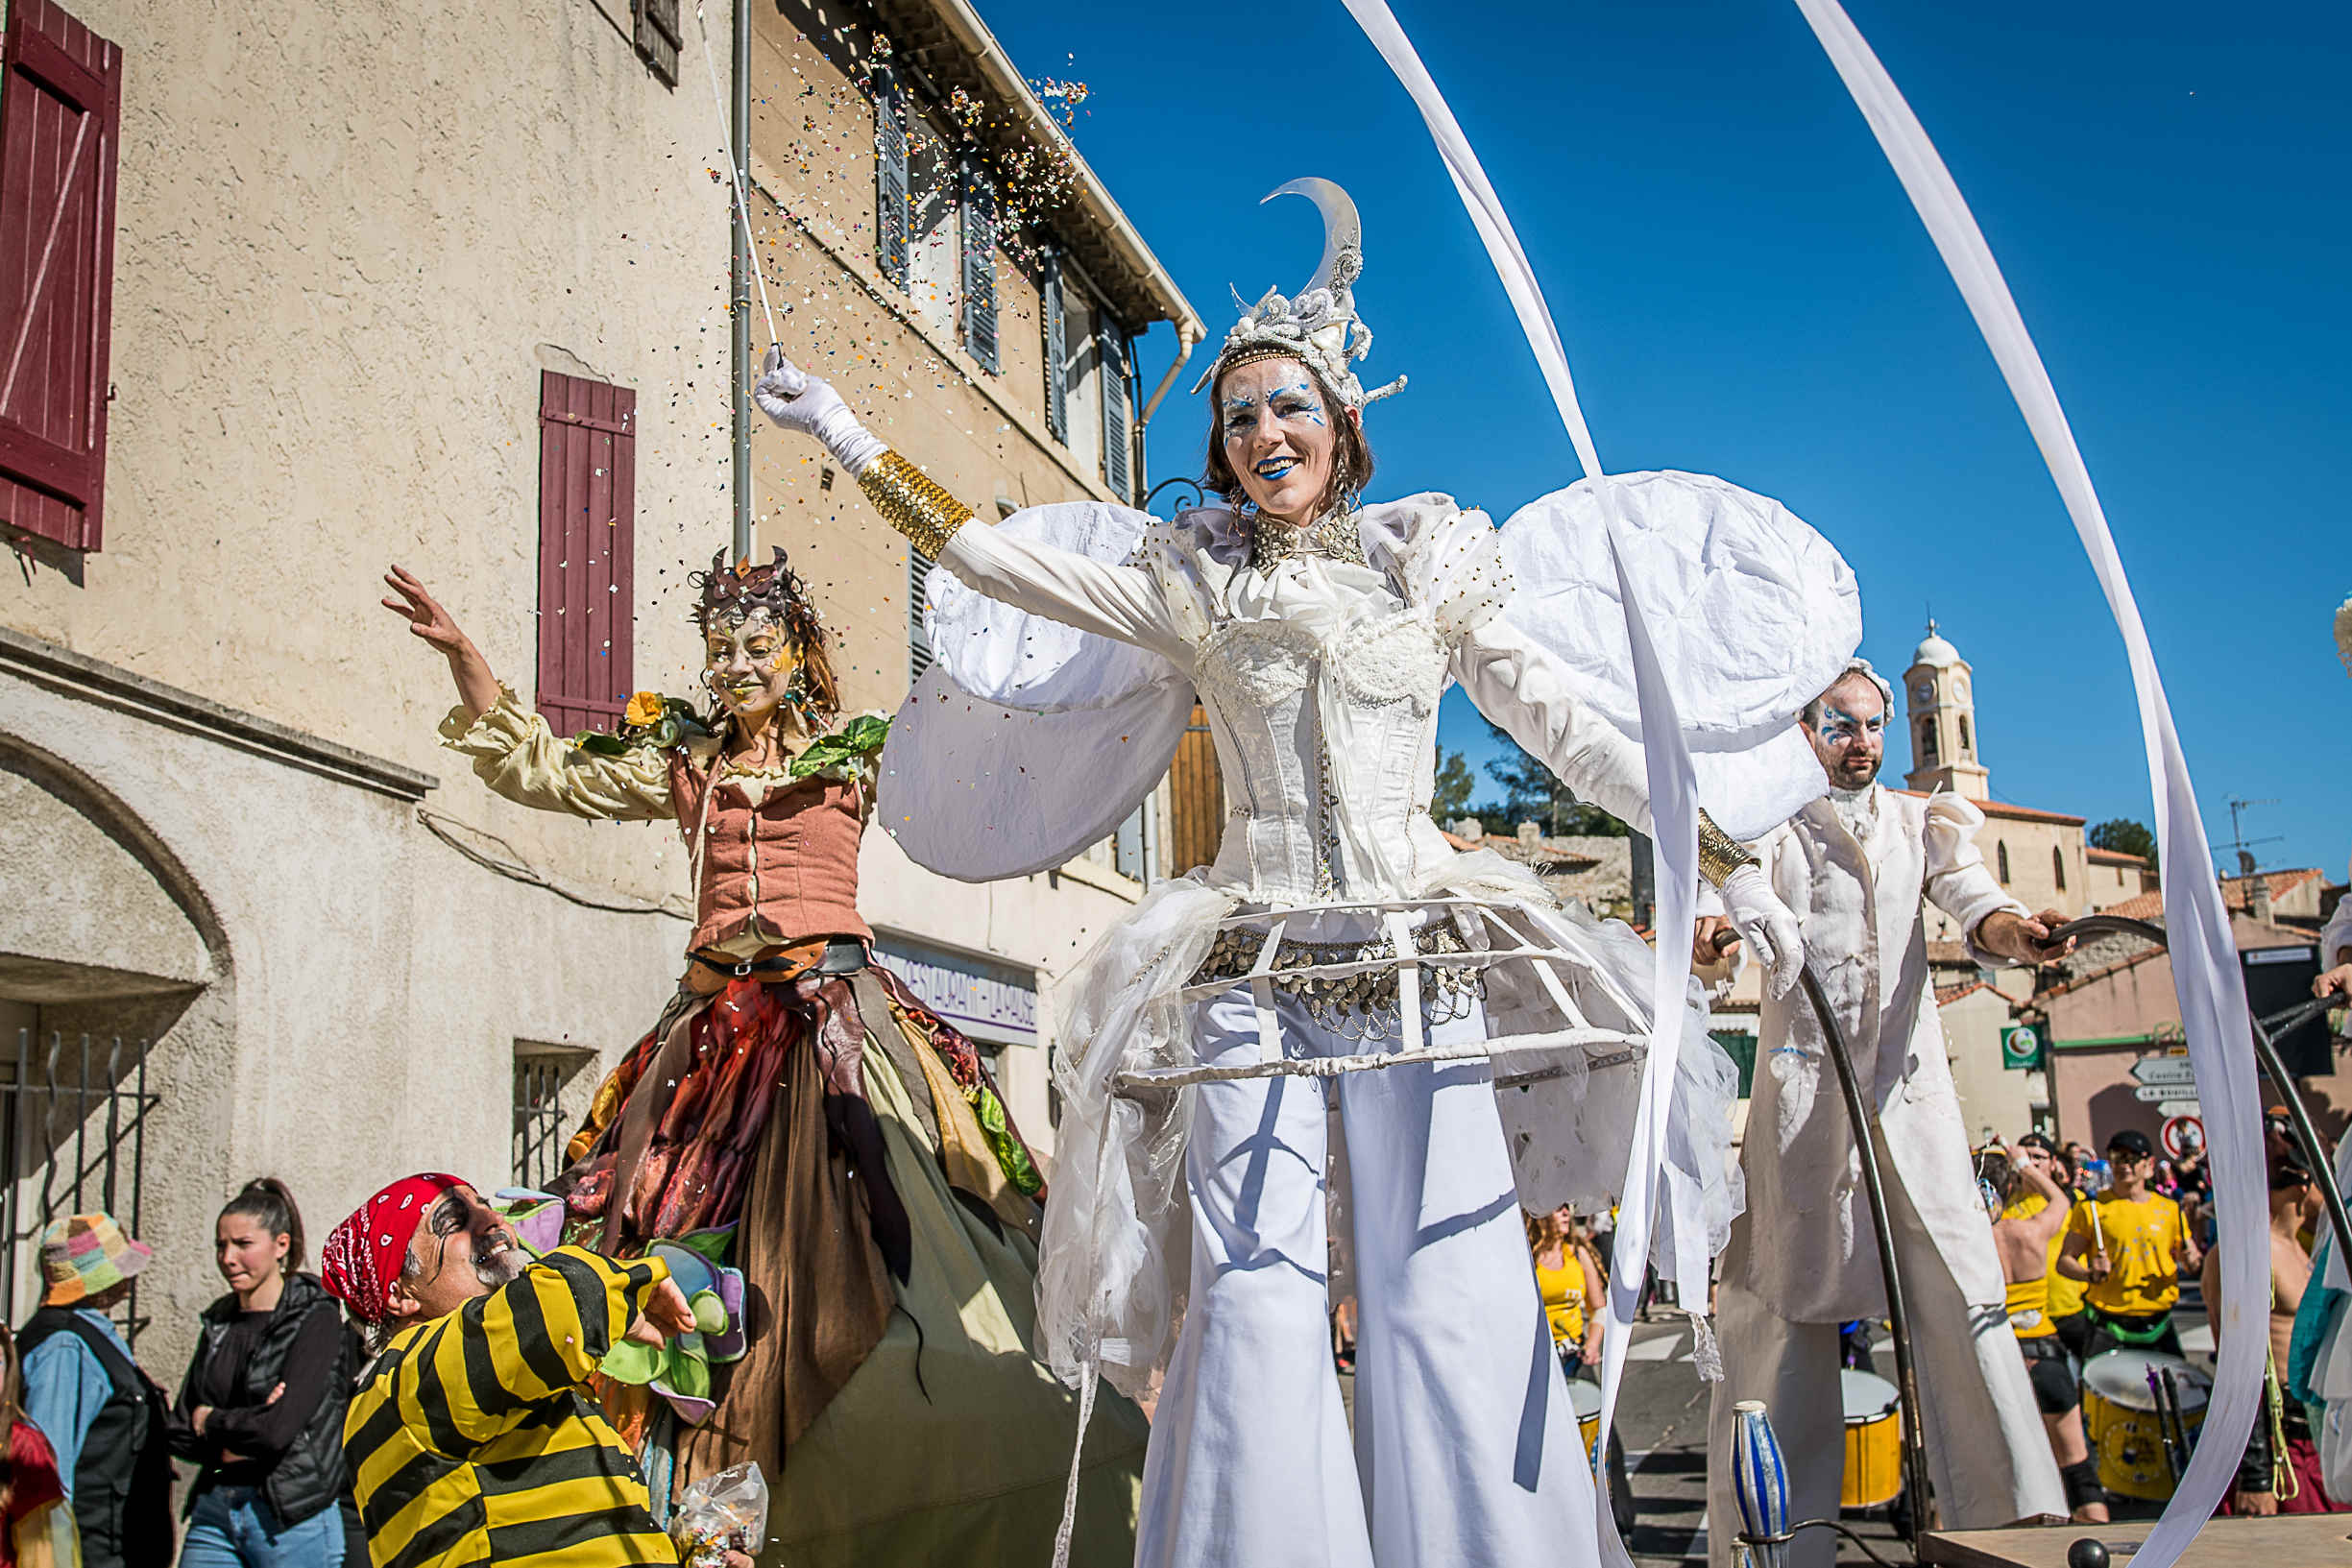 animation-carnaval-parade-de-rue-echassier-4-elements